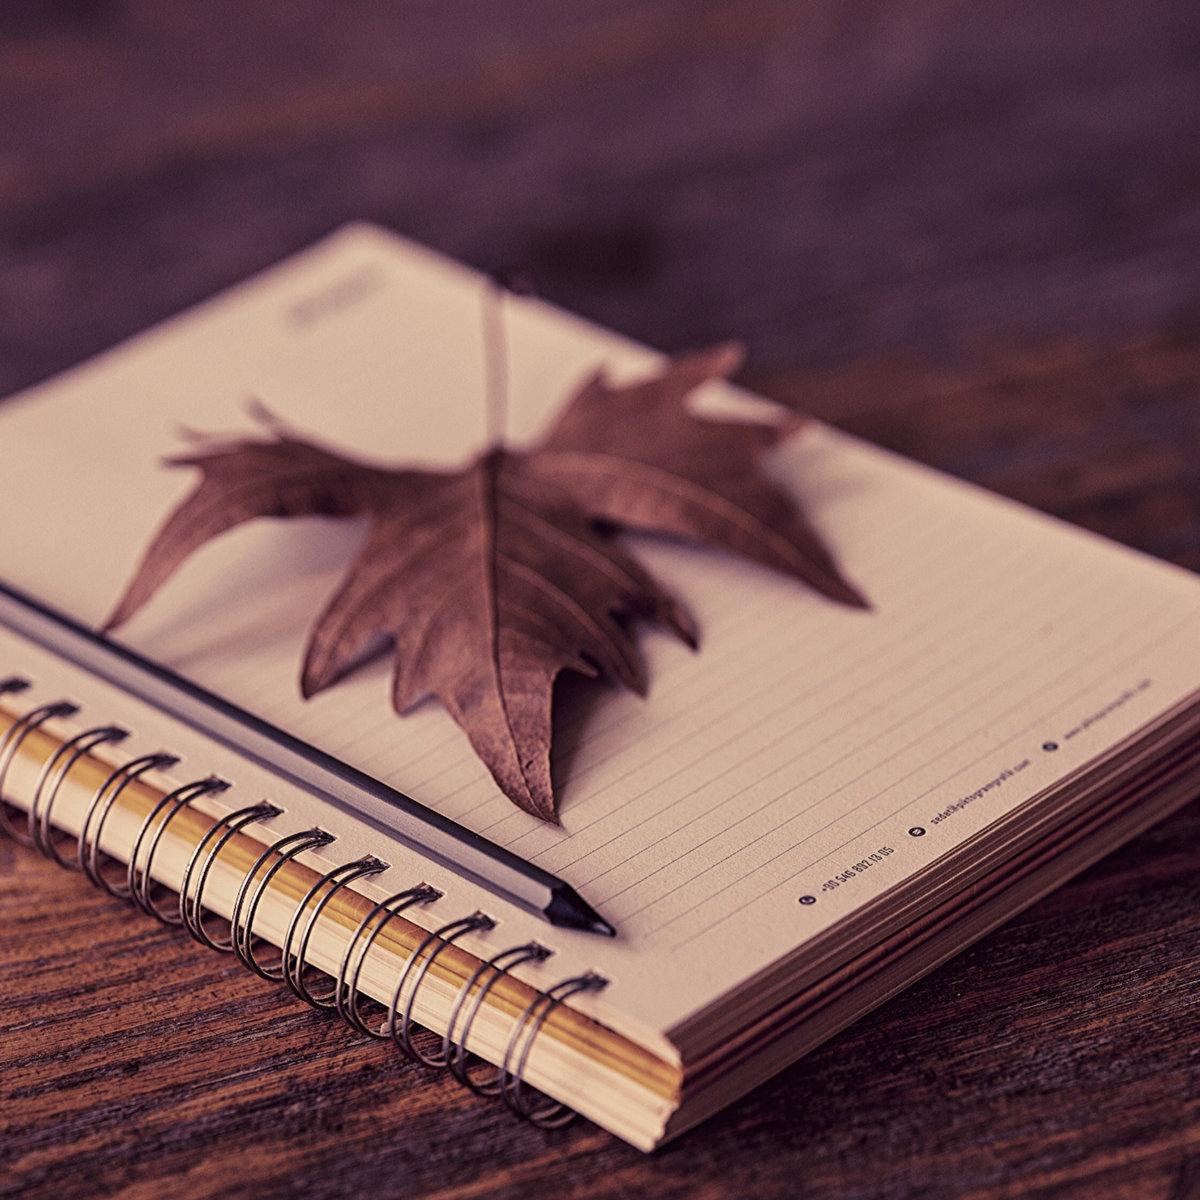 Autumn's Diary ft. Taiyo Ky by U'nique Music